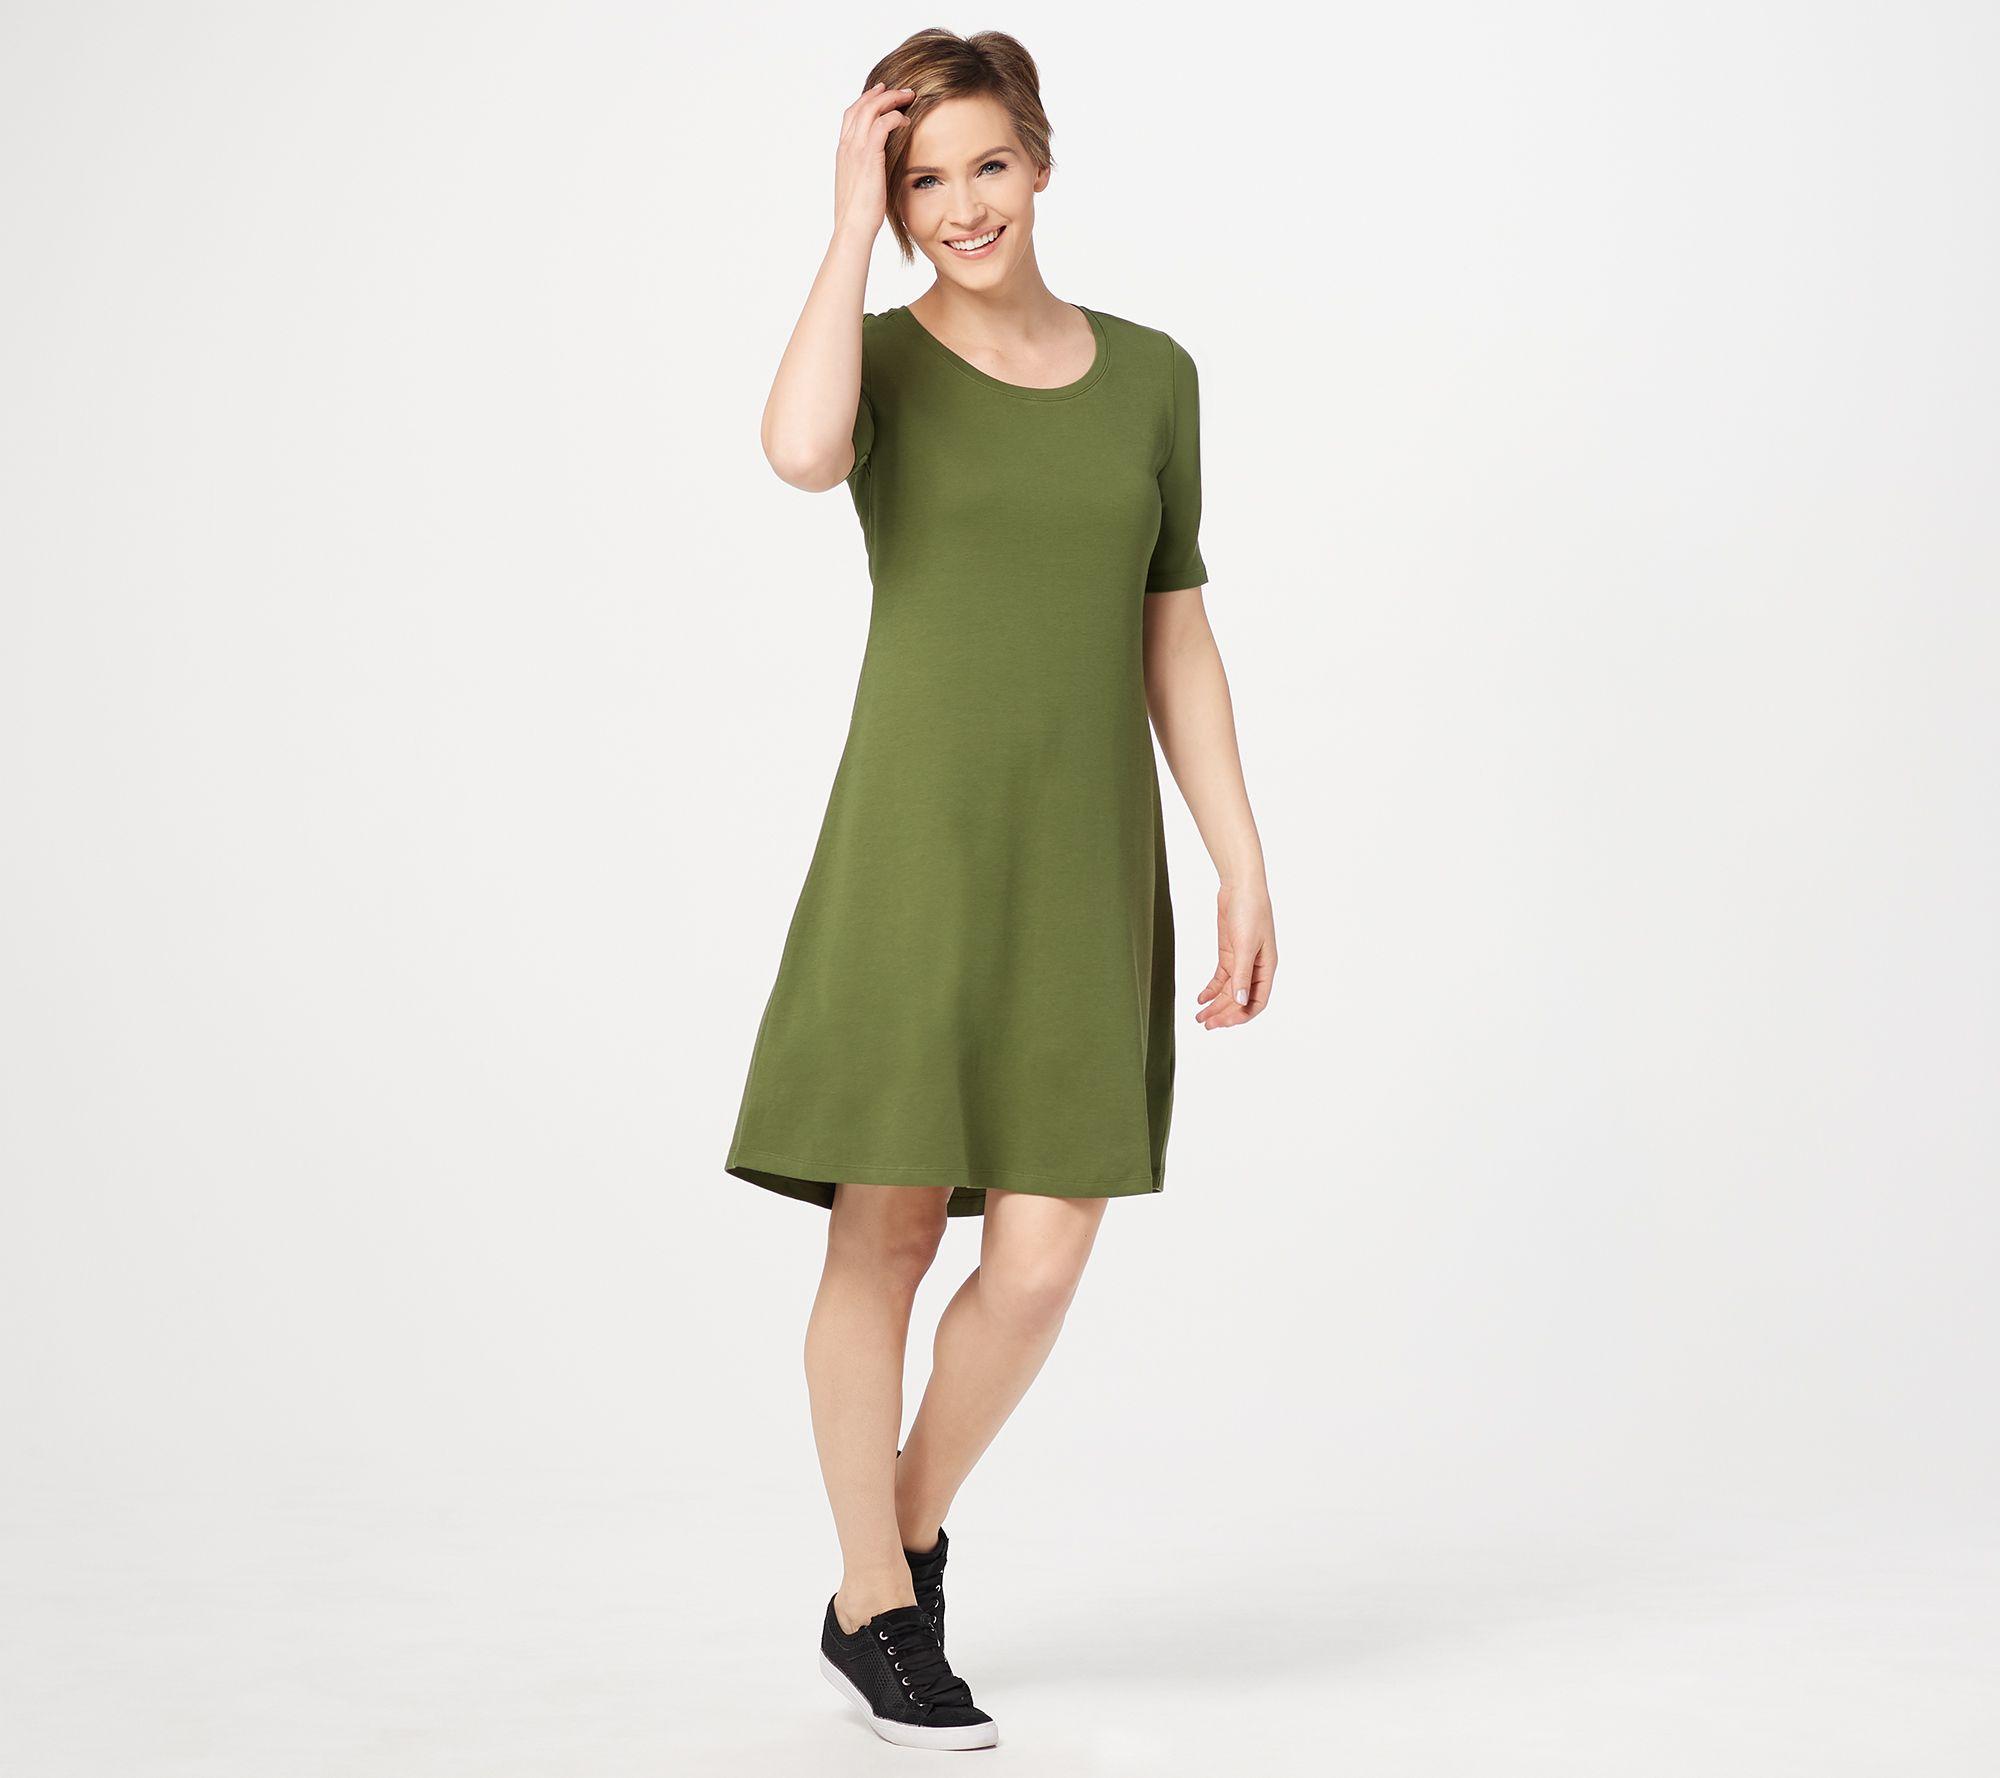 6d94ec94f905f Regular Essentials Pima Cotton Elbow- Sleeve Dress - Page 1 — QVC.com